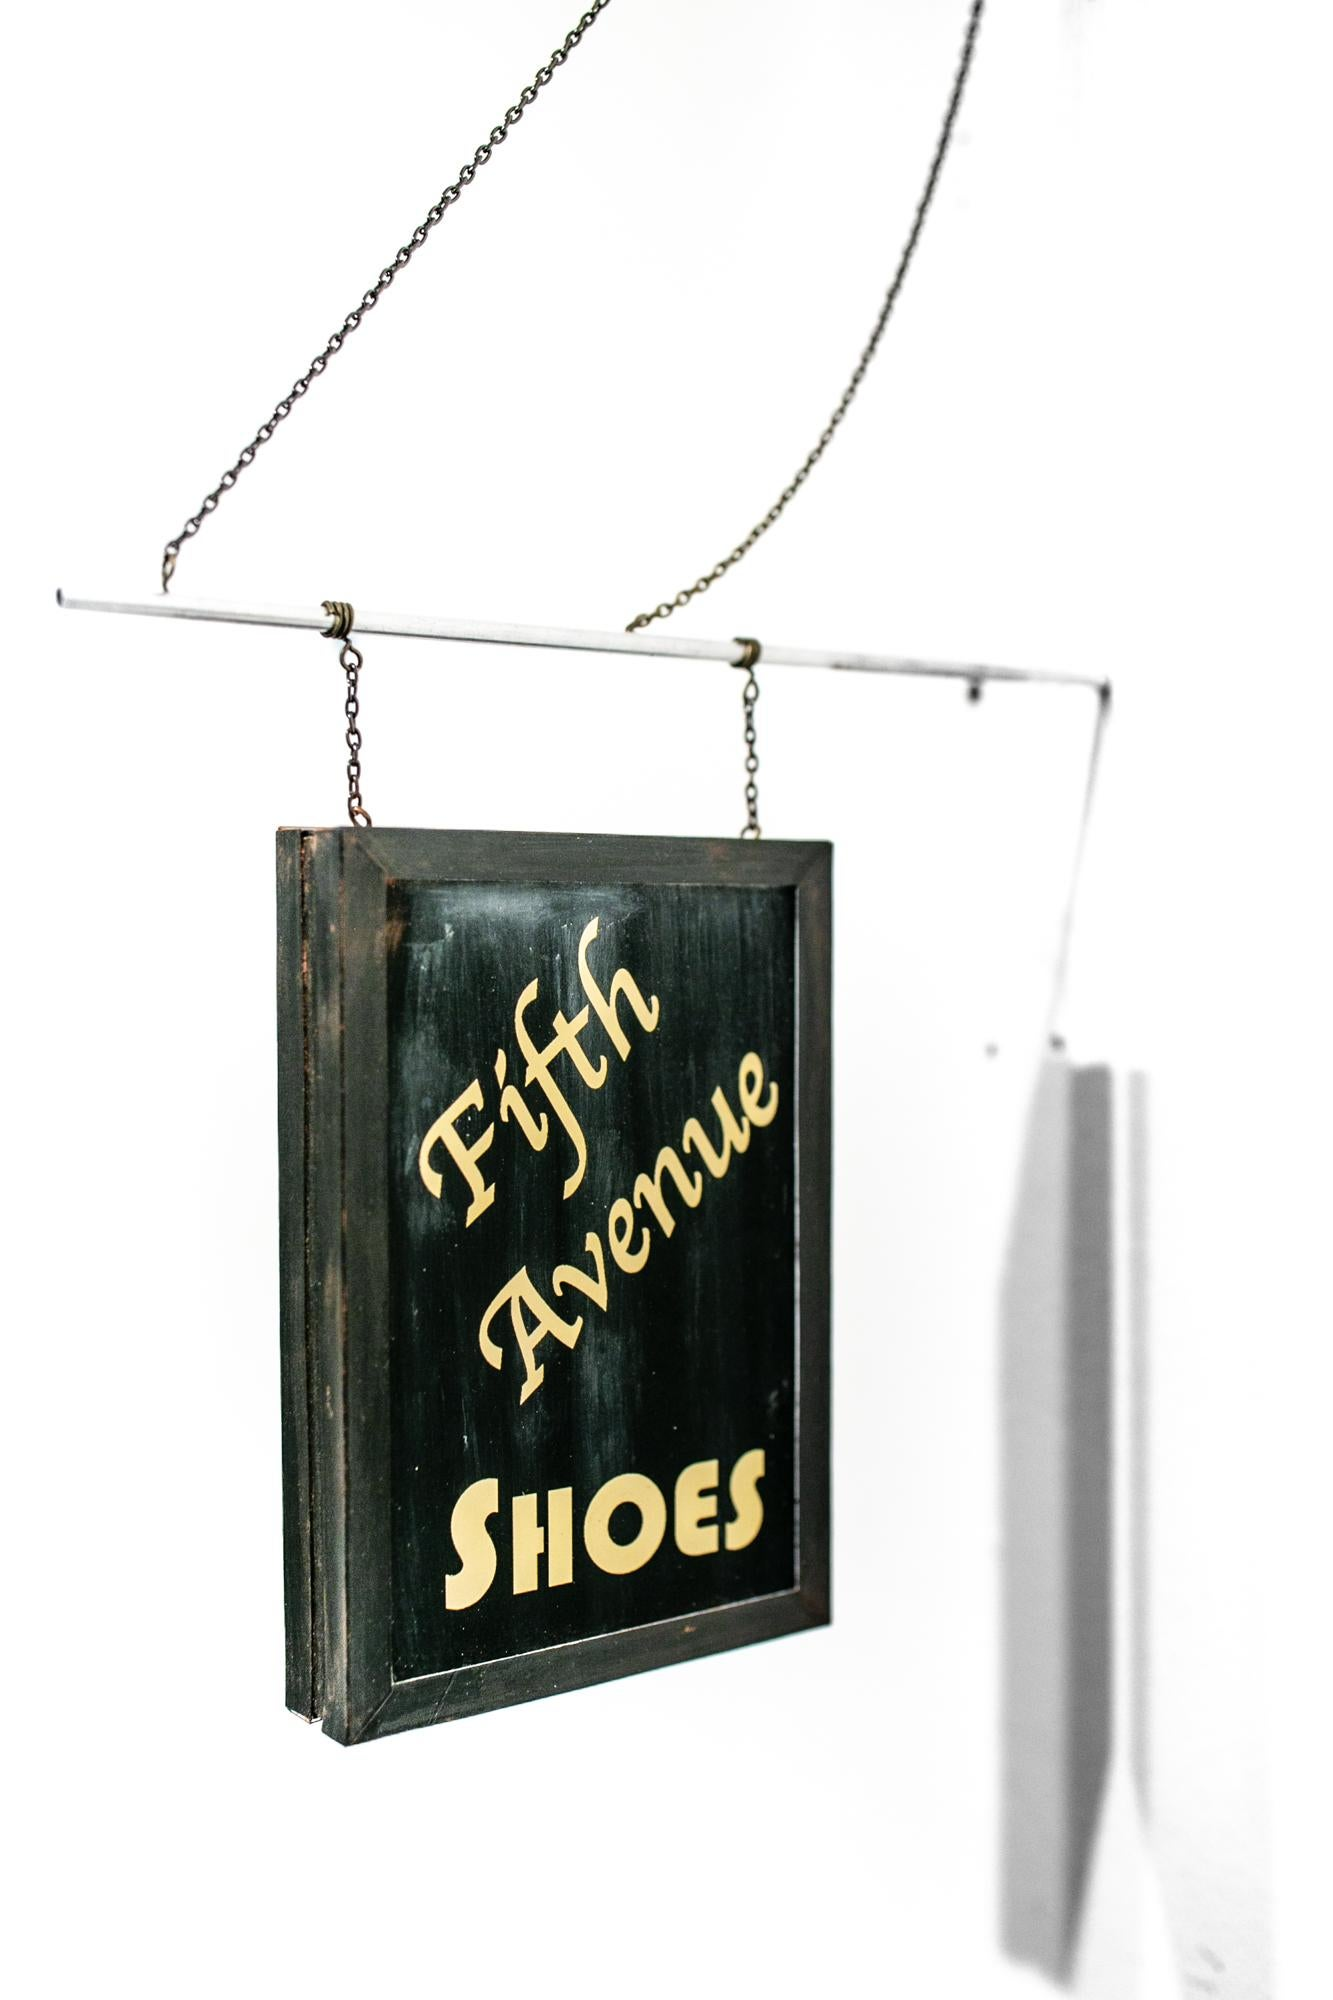 Fifth Avenue Shoes